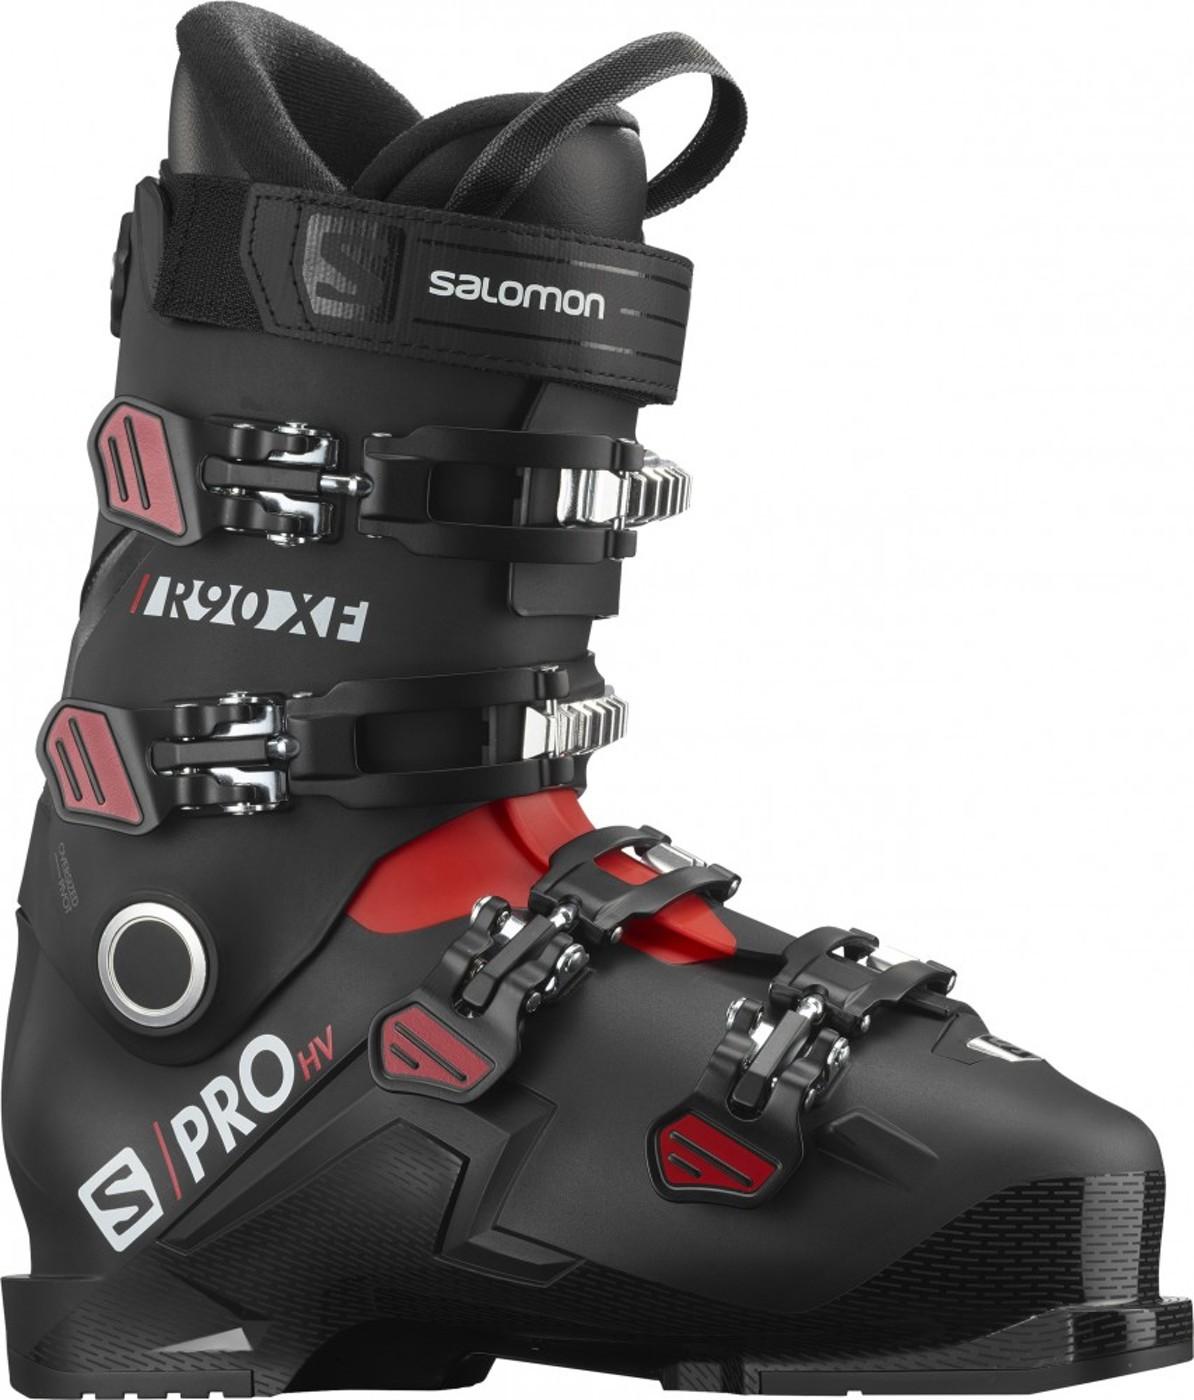 SALOMON S/PRO HV R90 XF - Herren